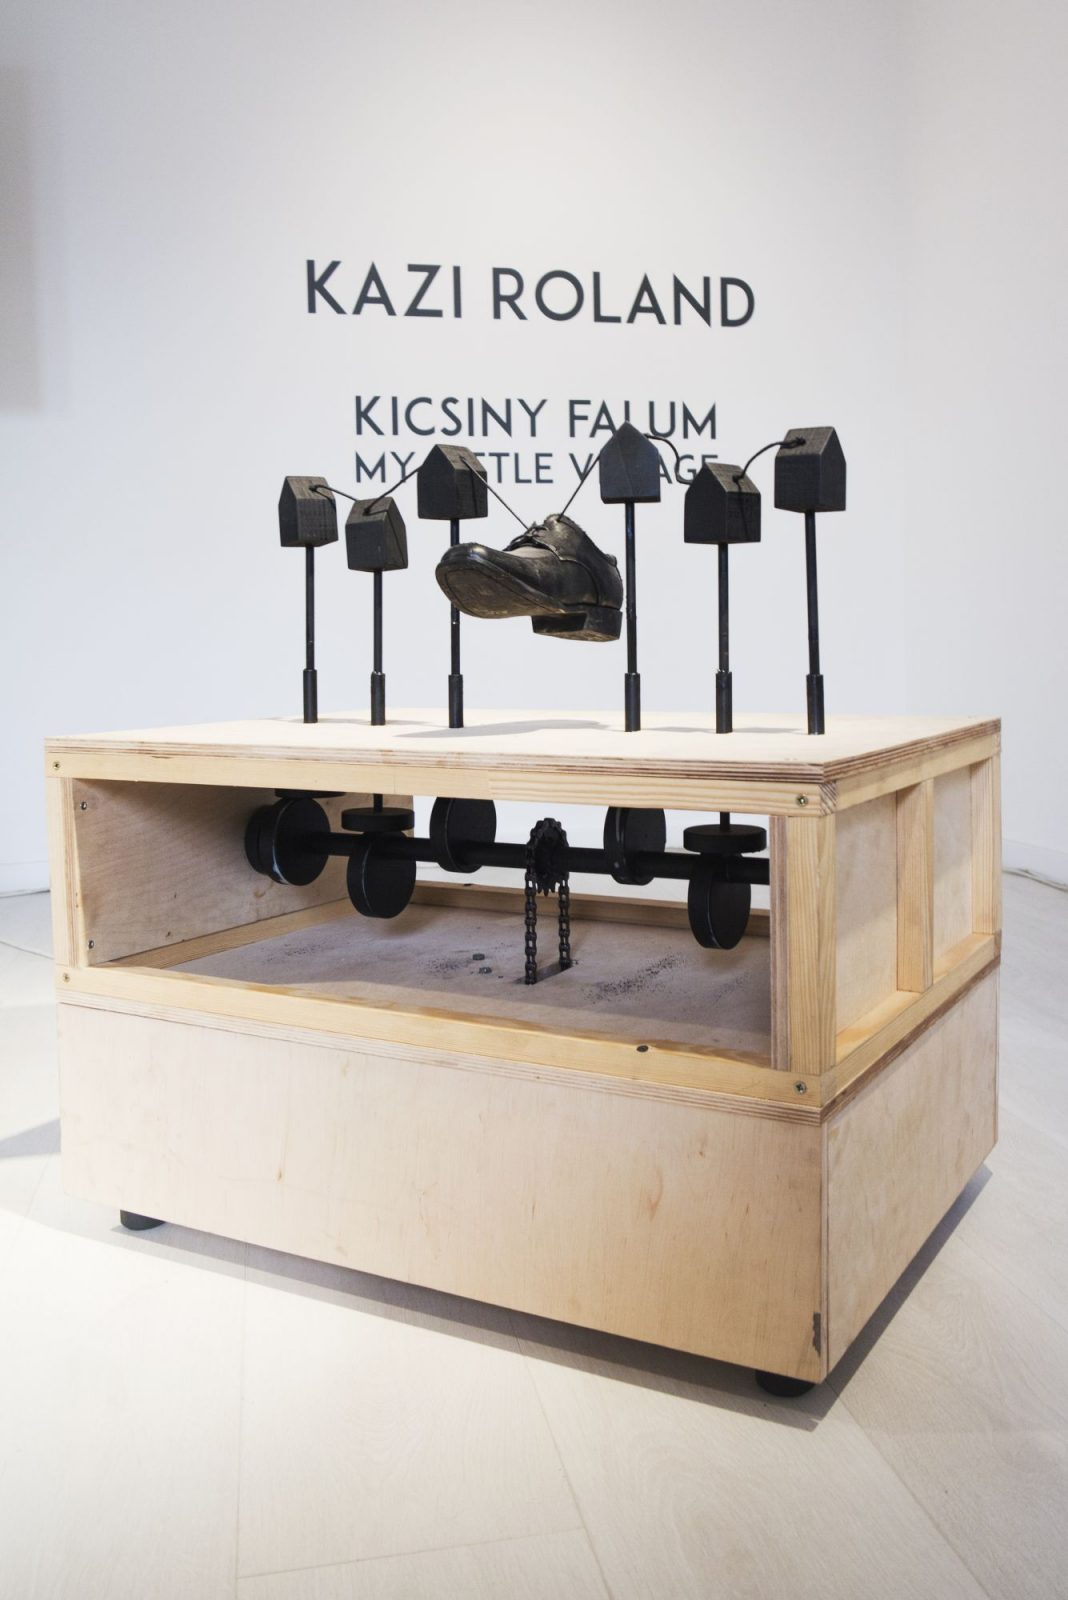 Roland Kazi: My Little Village III.